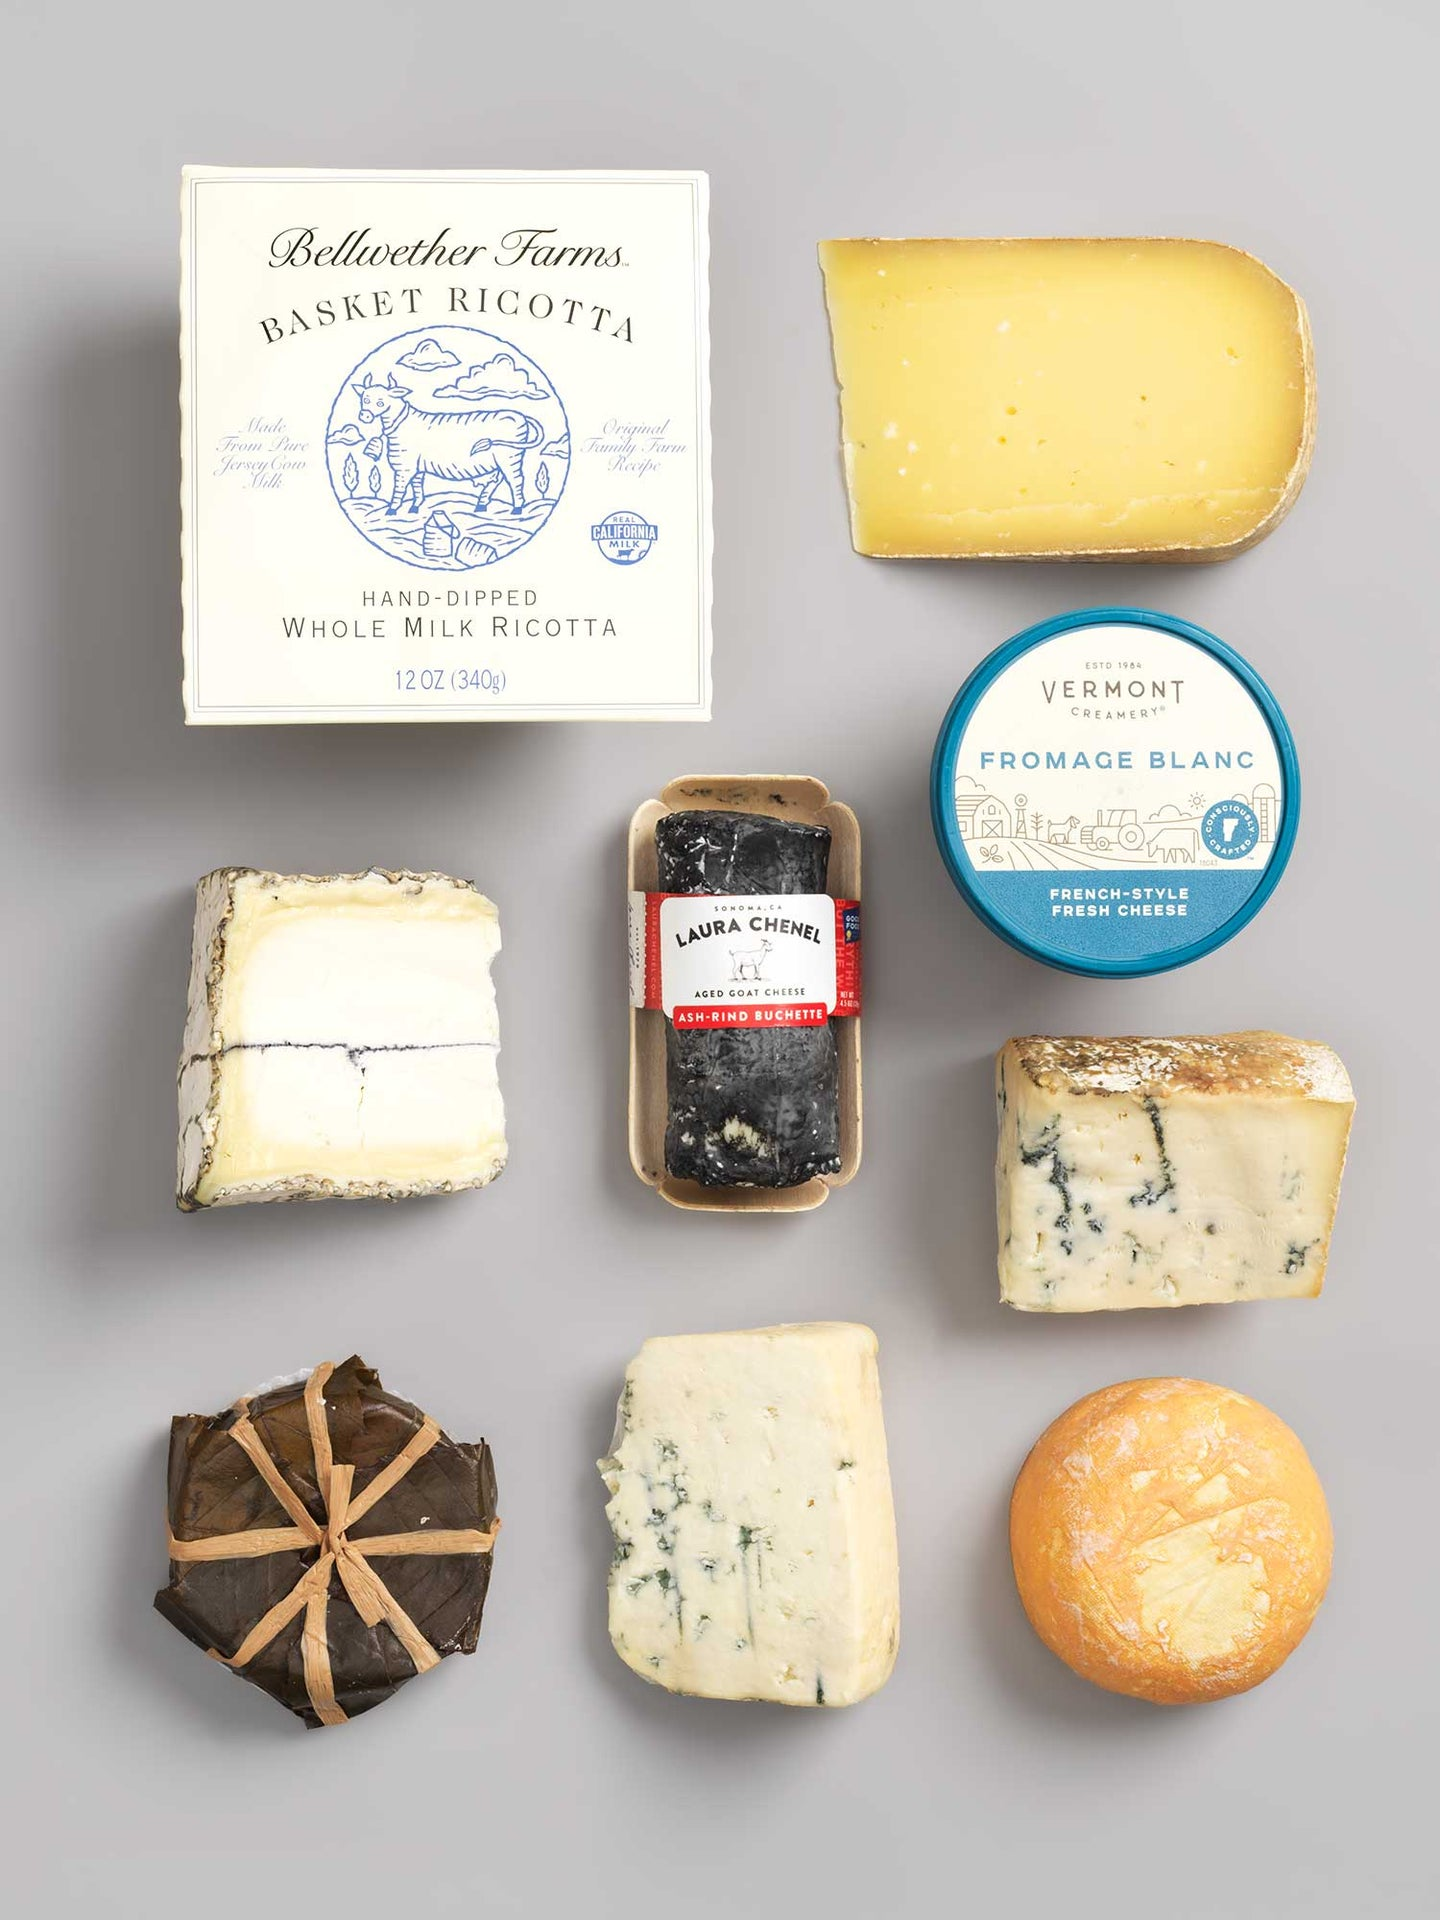 Some of Test Kitchen Director Kat Craddock's favorite American cheesemakers.